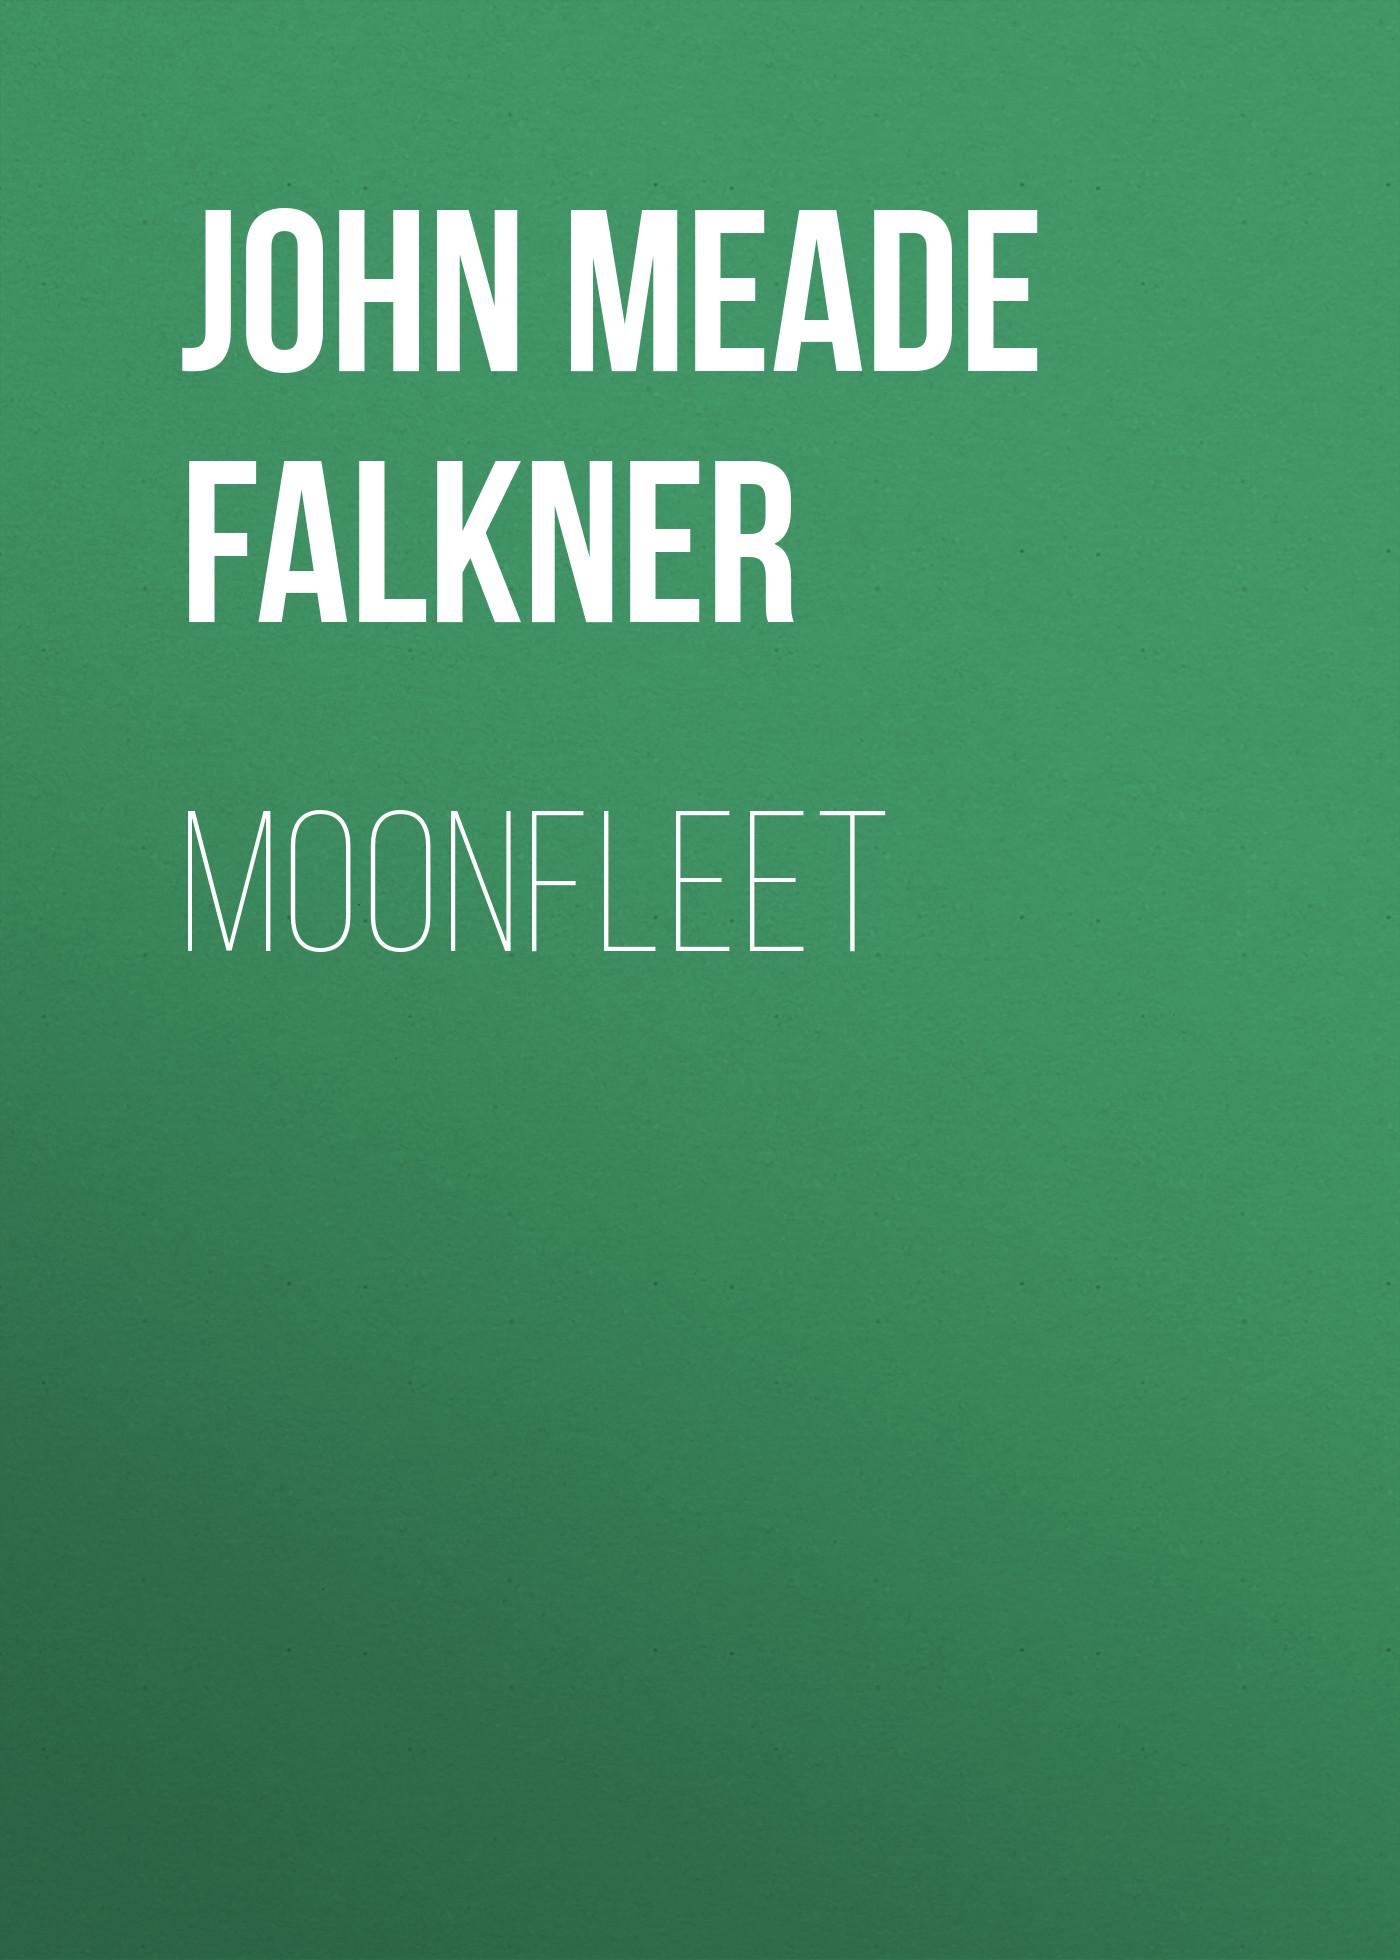 John Meade Falkner Moonfleet телескоп meade ds 2130ats lnt серии ii